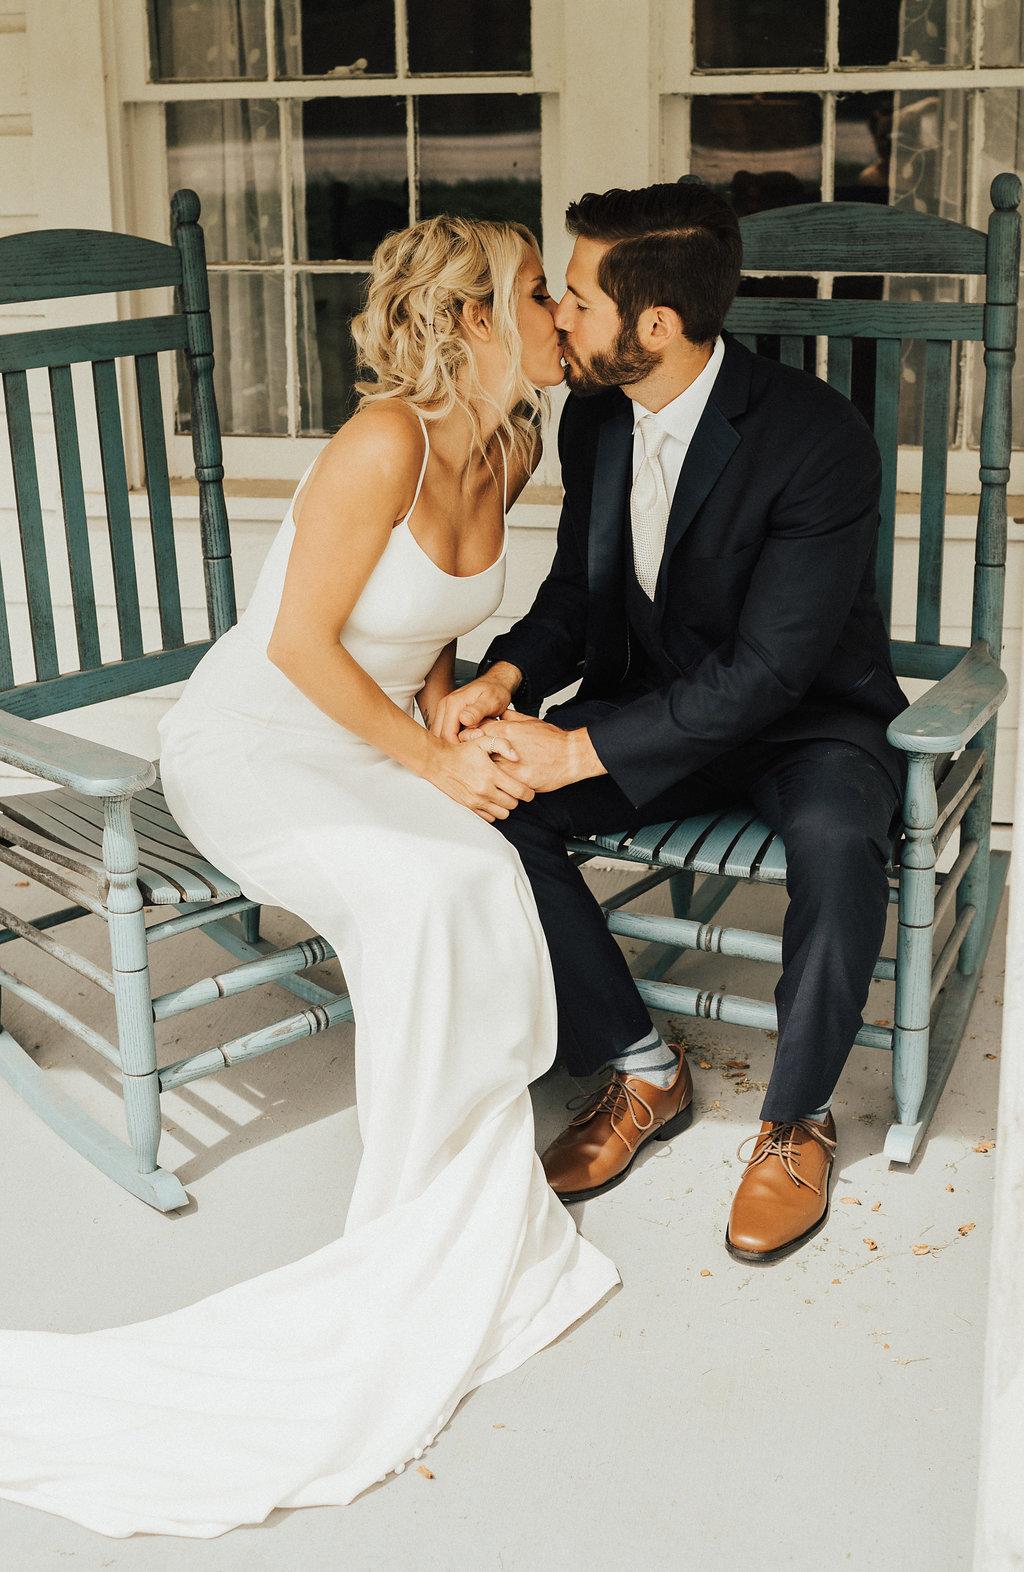 Elegant Wedding At The Wheeler House Barn In Small Town Ballground 1497486151 742130101